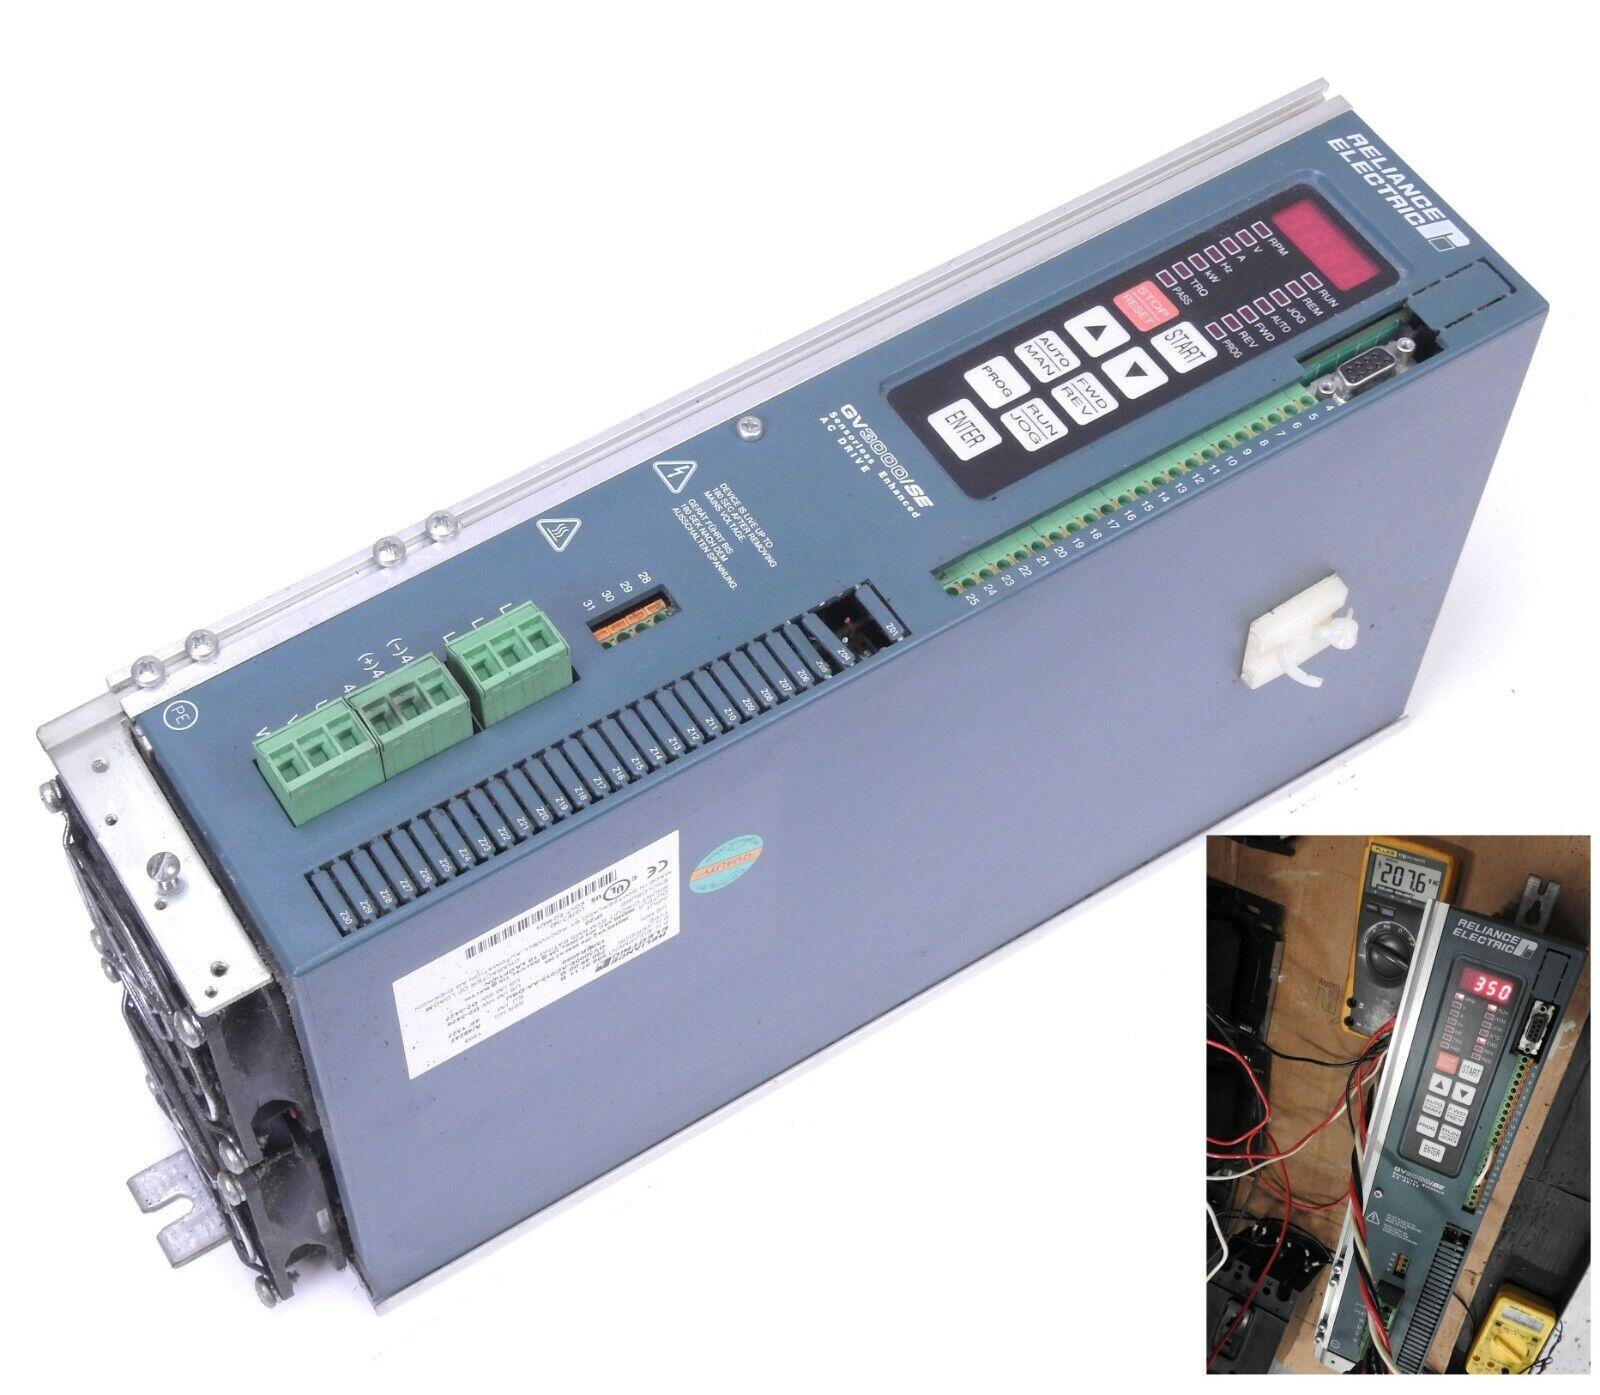 Reliance Electric GV3000E-AC015-AA-DBU